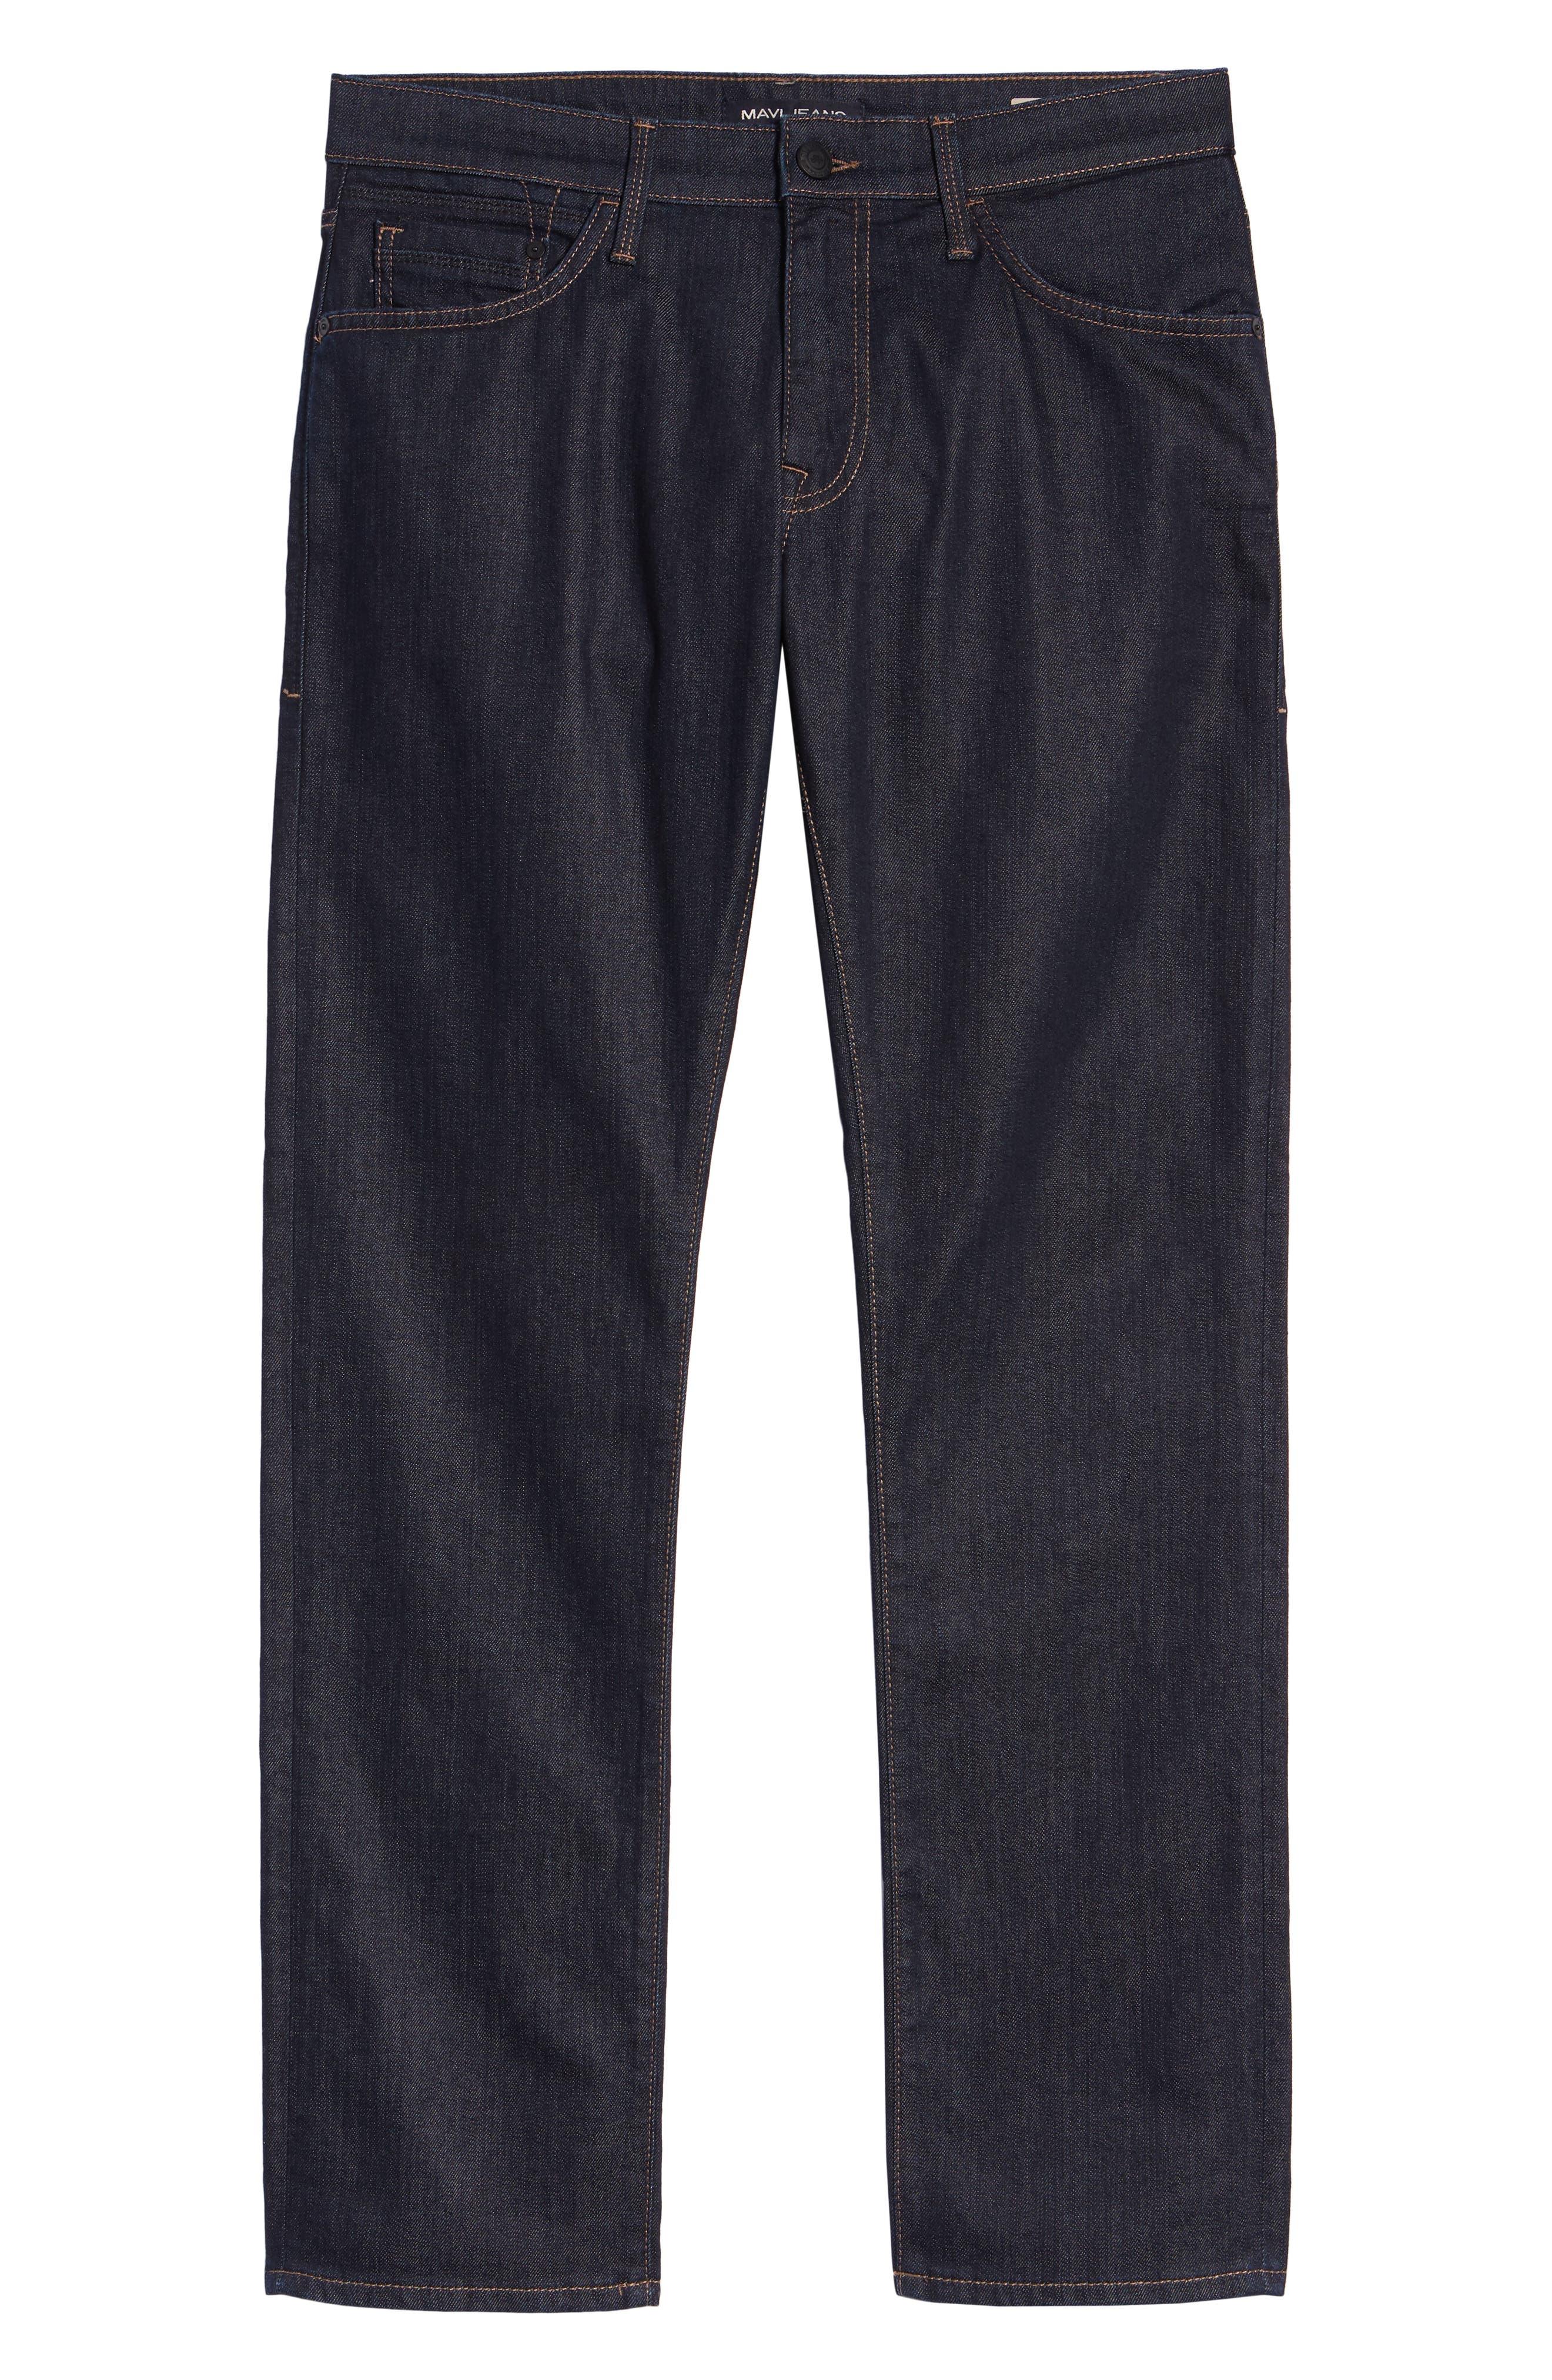 Zach Straight Leg Jeans,                             Alternate thumbnail 2, color,                             RINSE WILLIAMSBURG